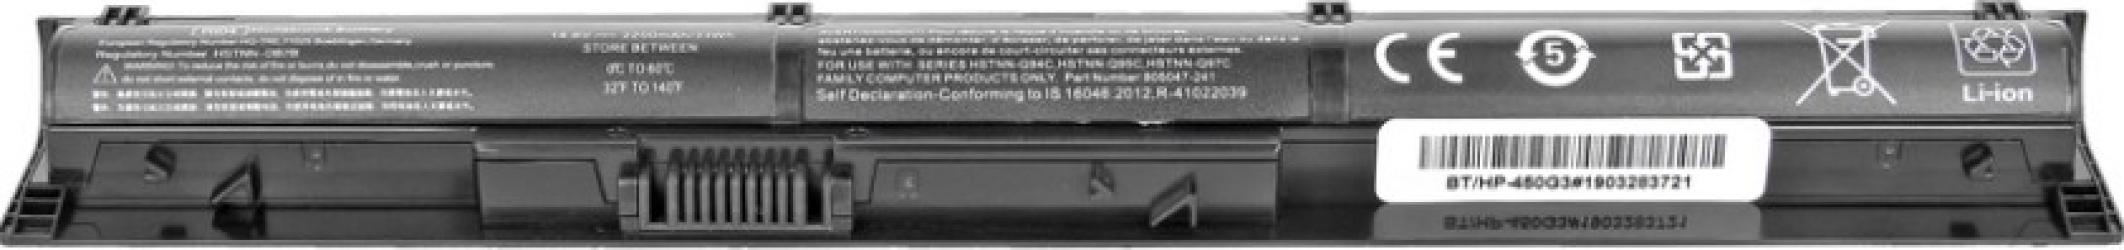 Baterie laptop ECO BOX compatibila HP ProBook 450 470 G3 2200 mAh HSTNN-DB7B 805294-001